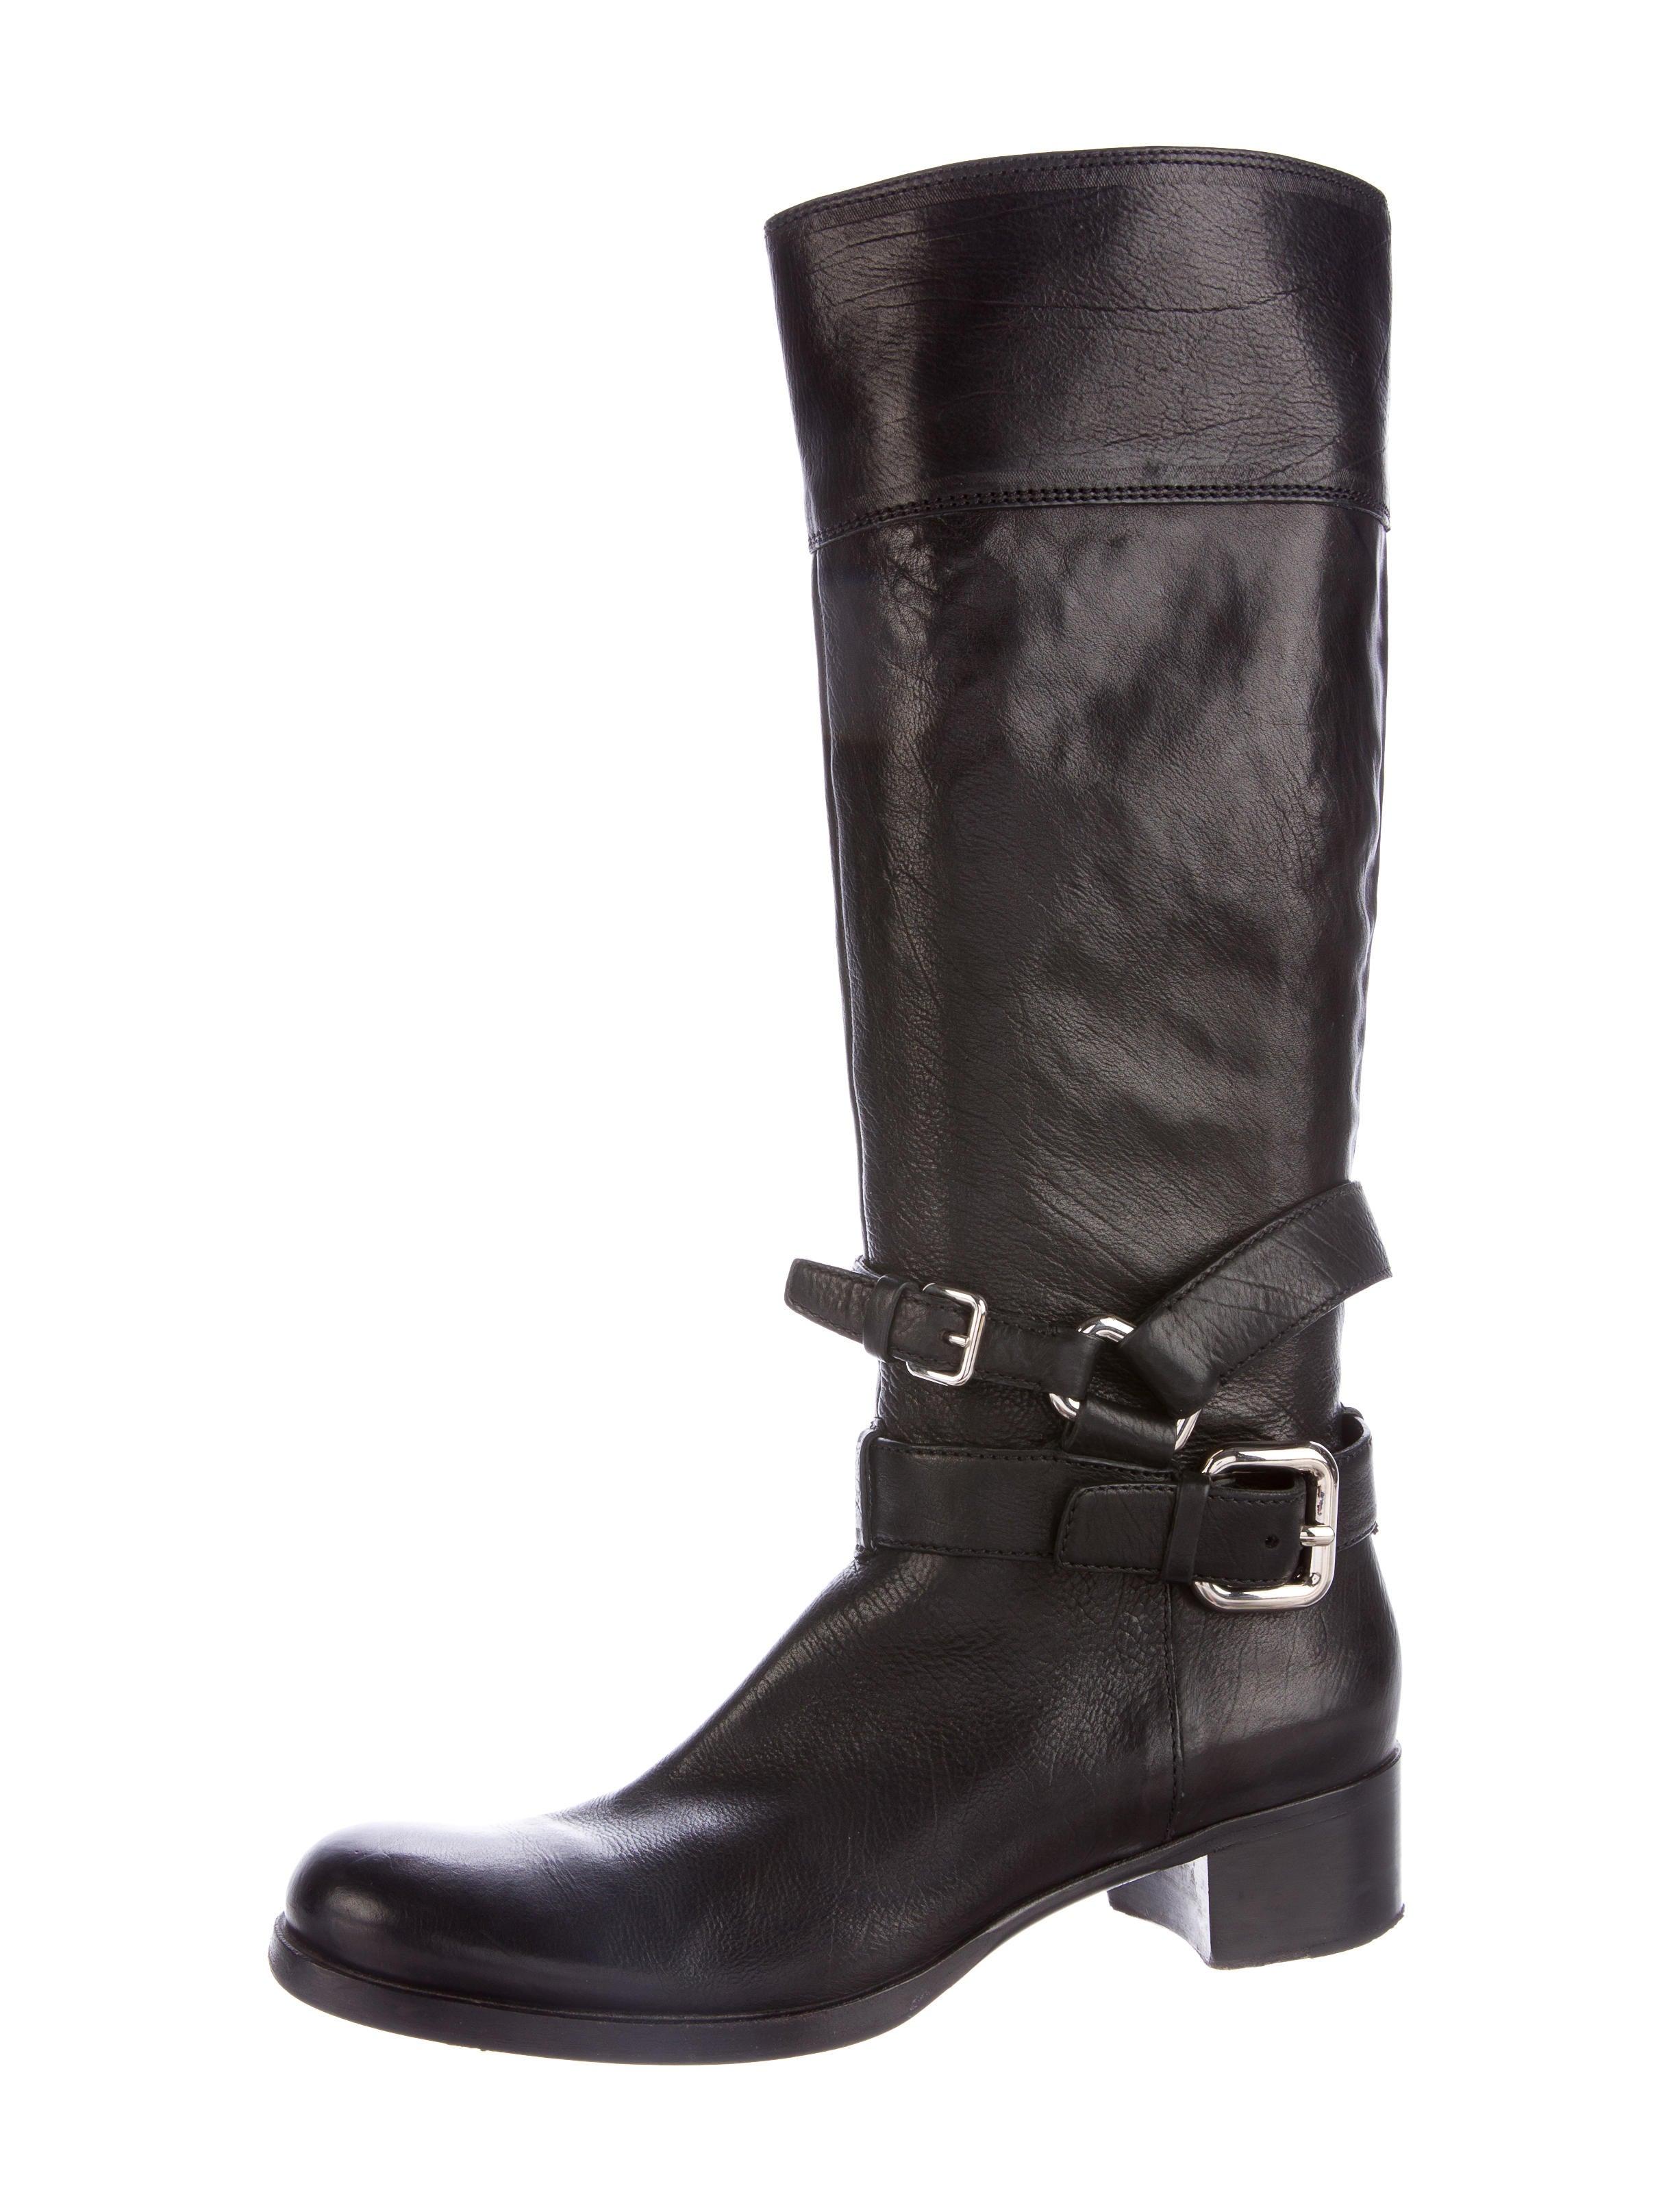 miu miu buckle accented knee high boots shoes miu46572